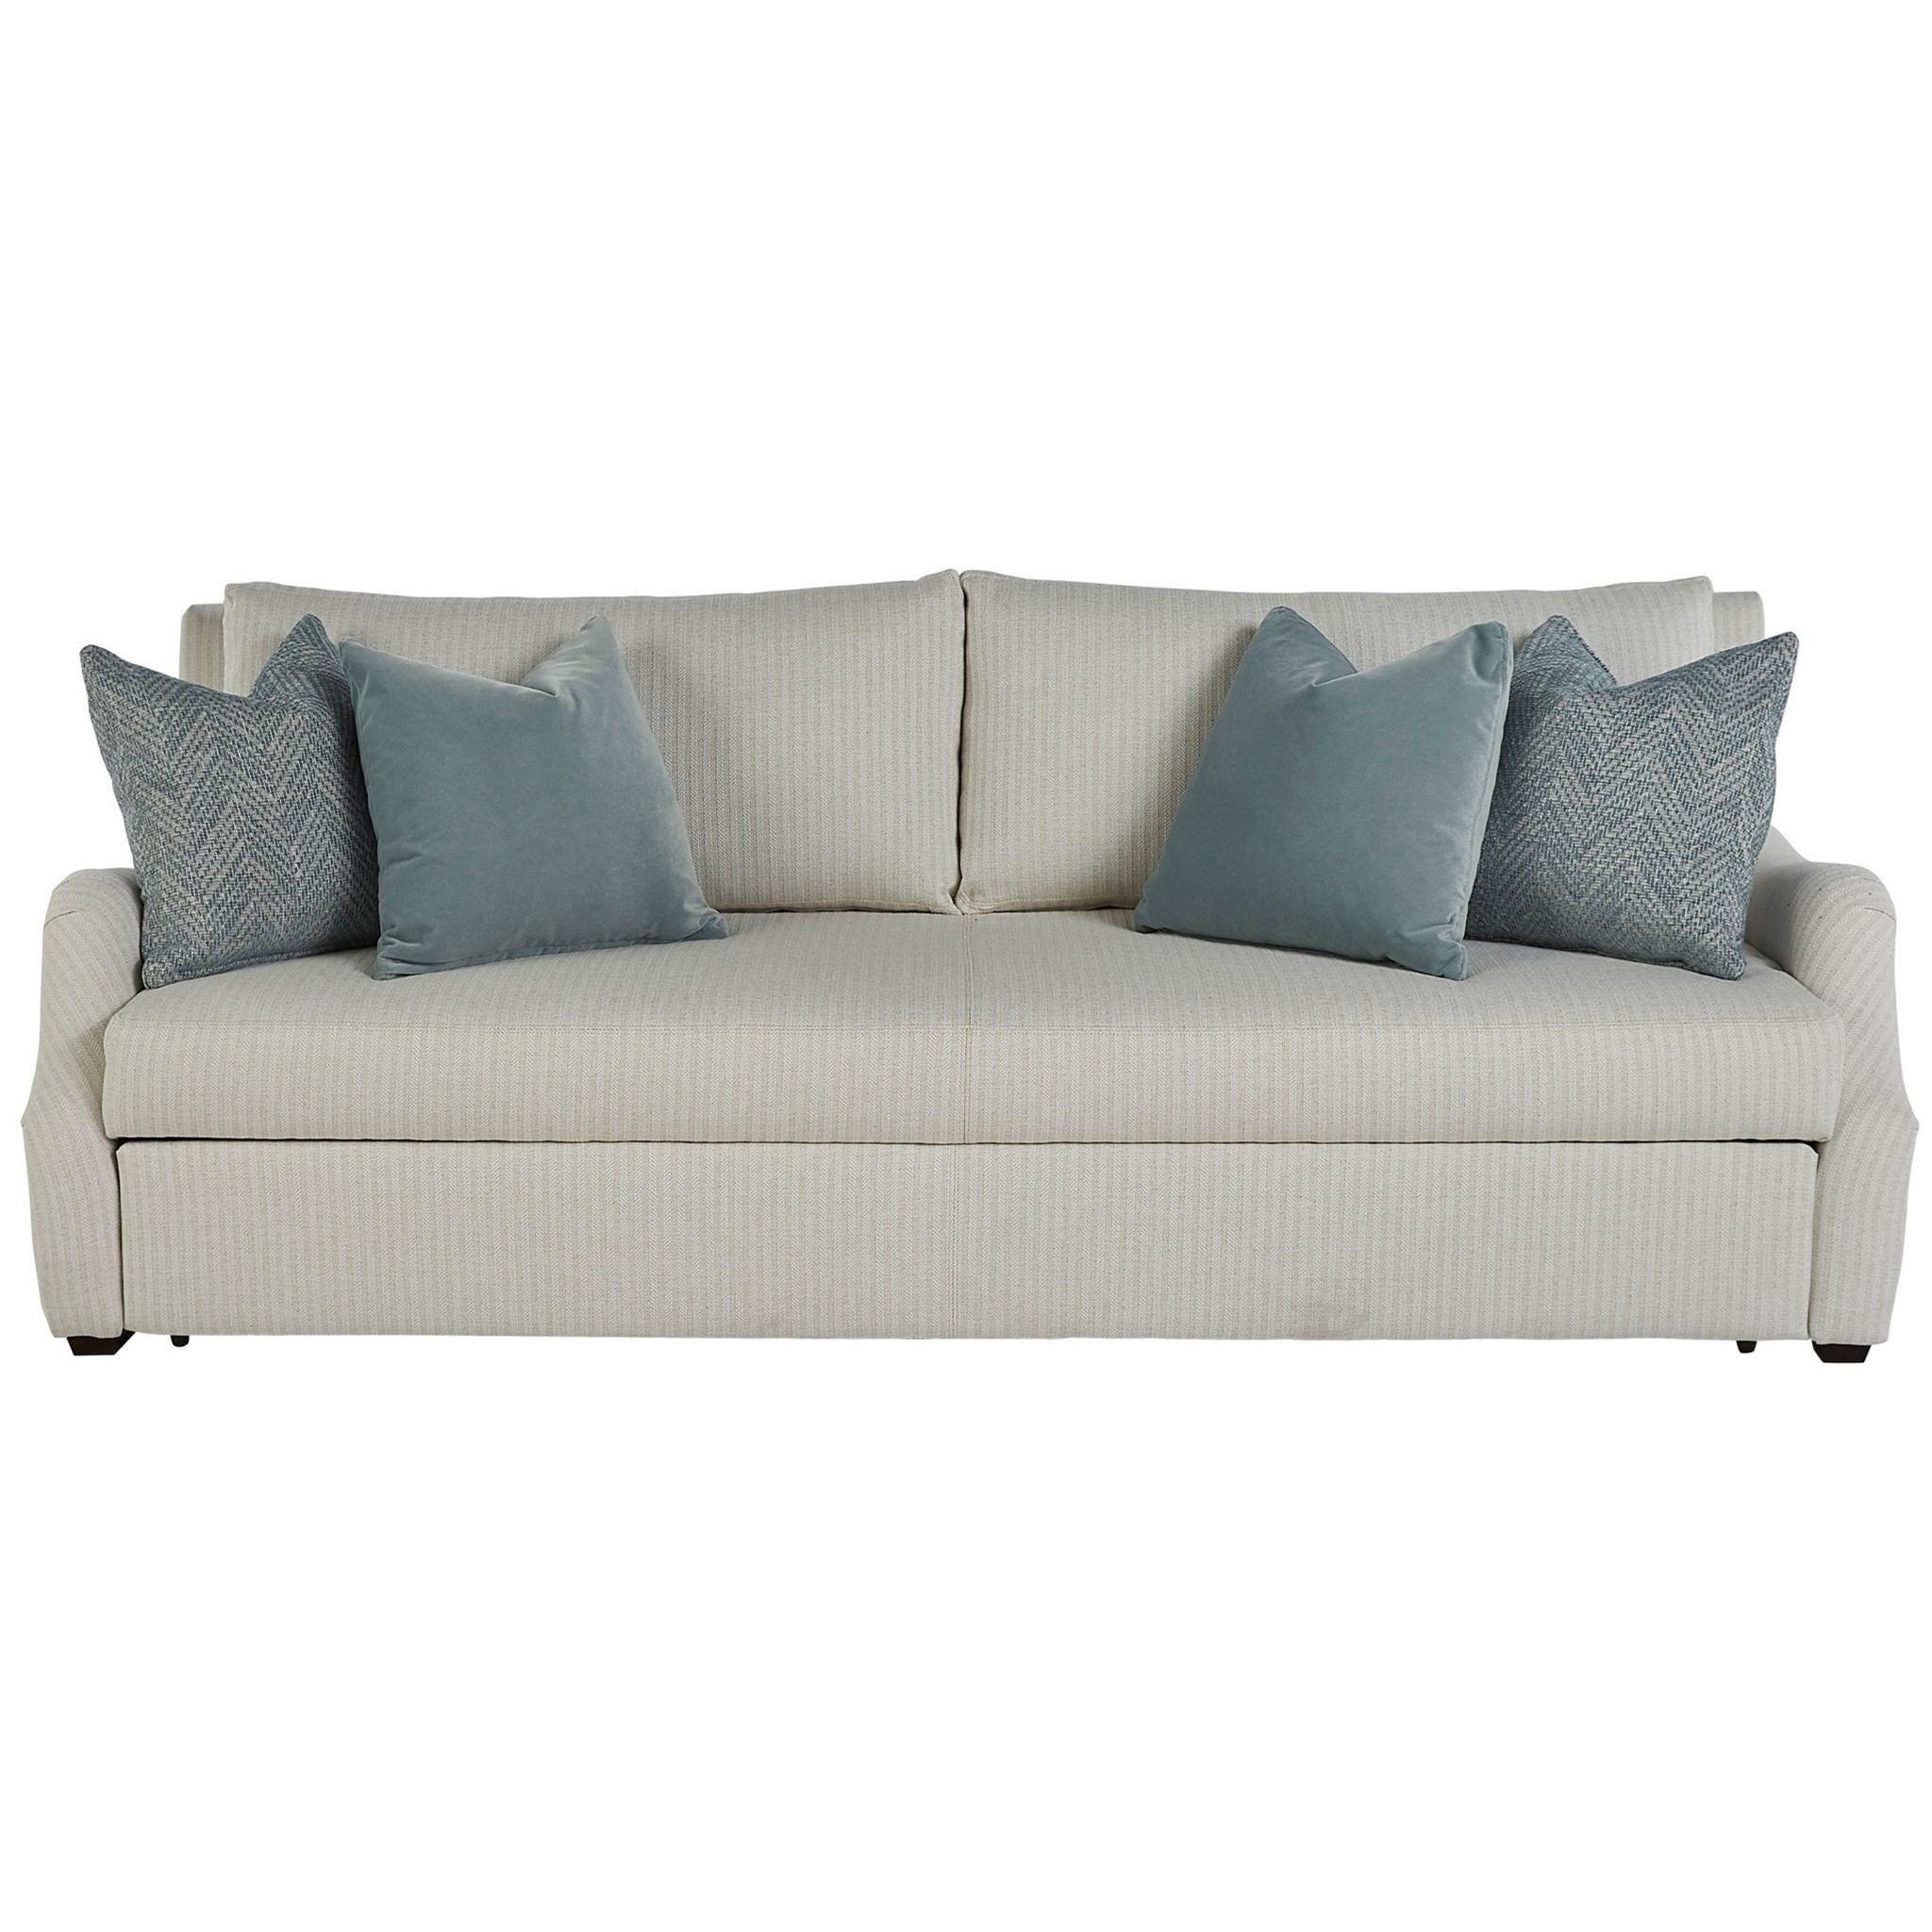 Coastal Living Home - Getaway Sofa Sleeper by Universal at Baer's Furniture